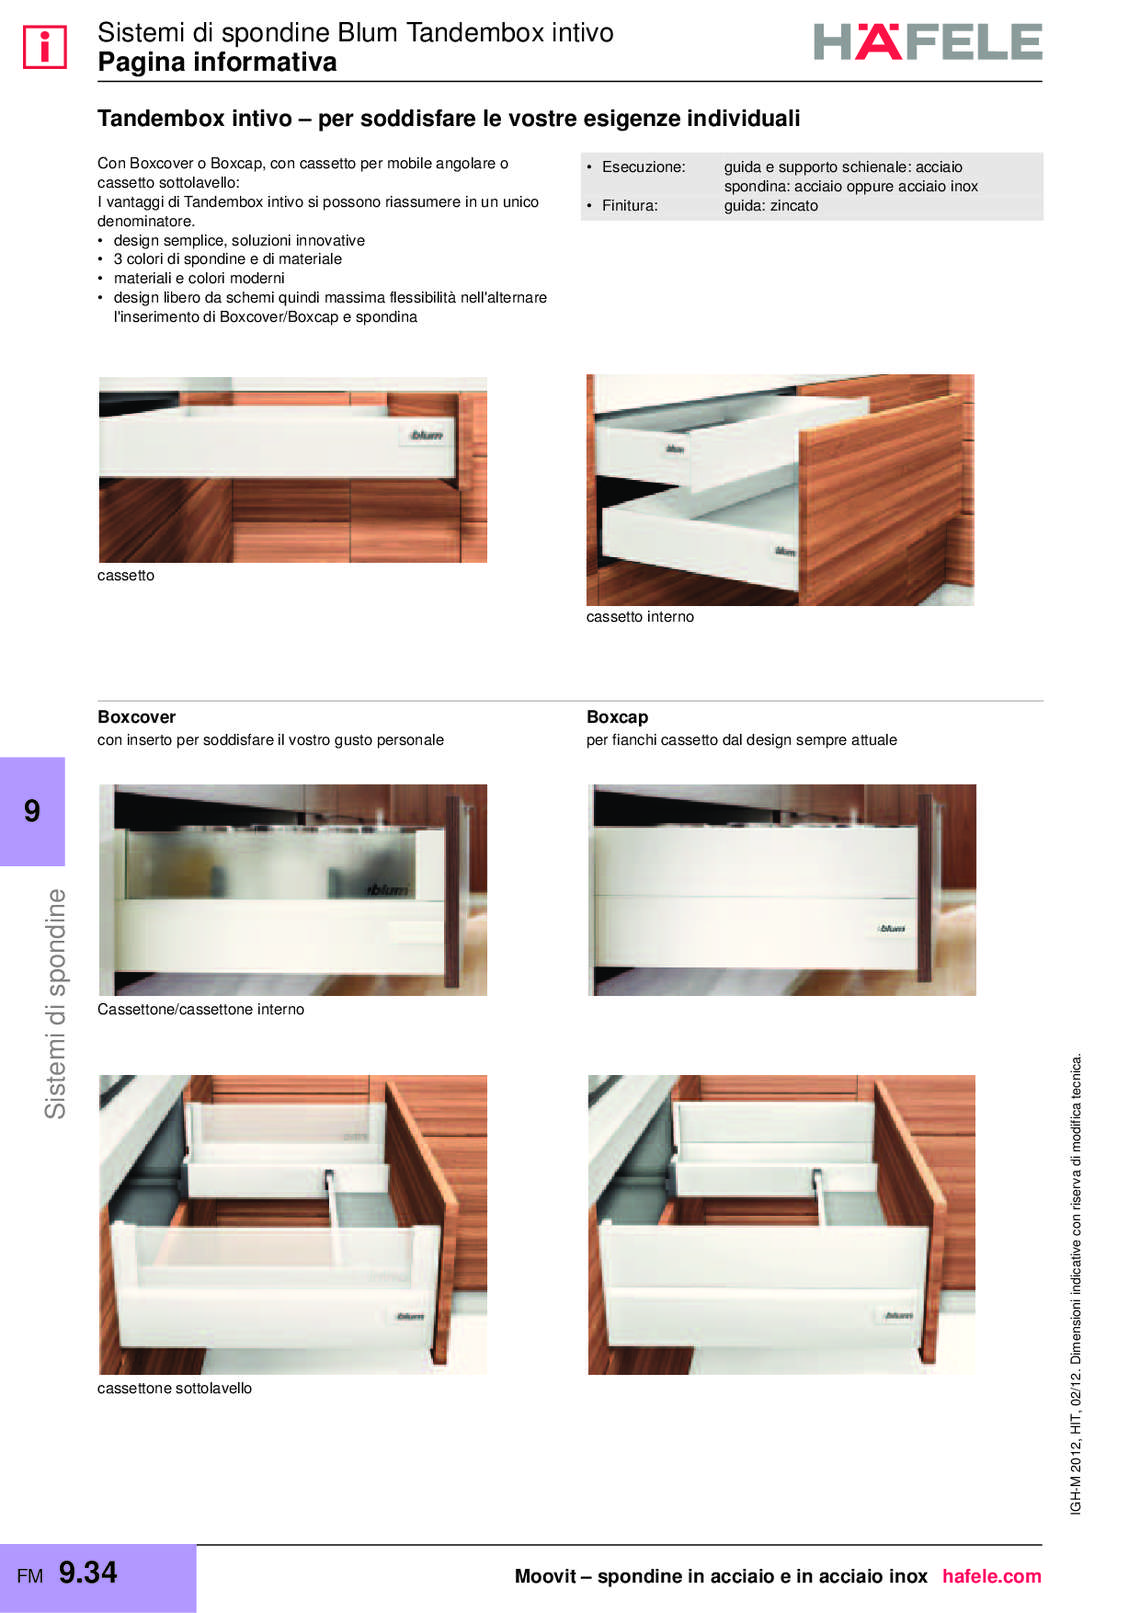 hafele-spondine-e-guide-per-mobili_40_047.jpg